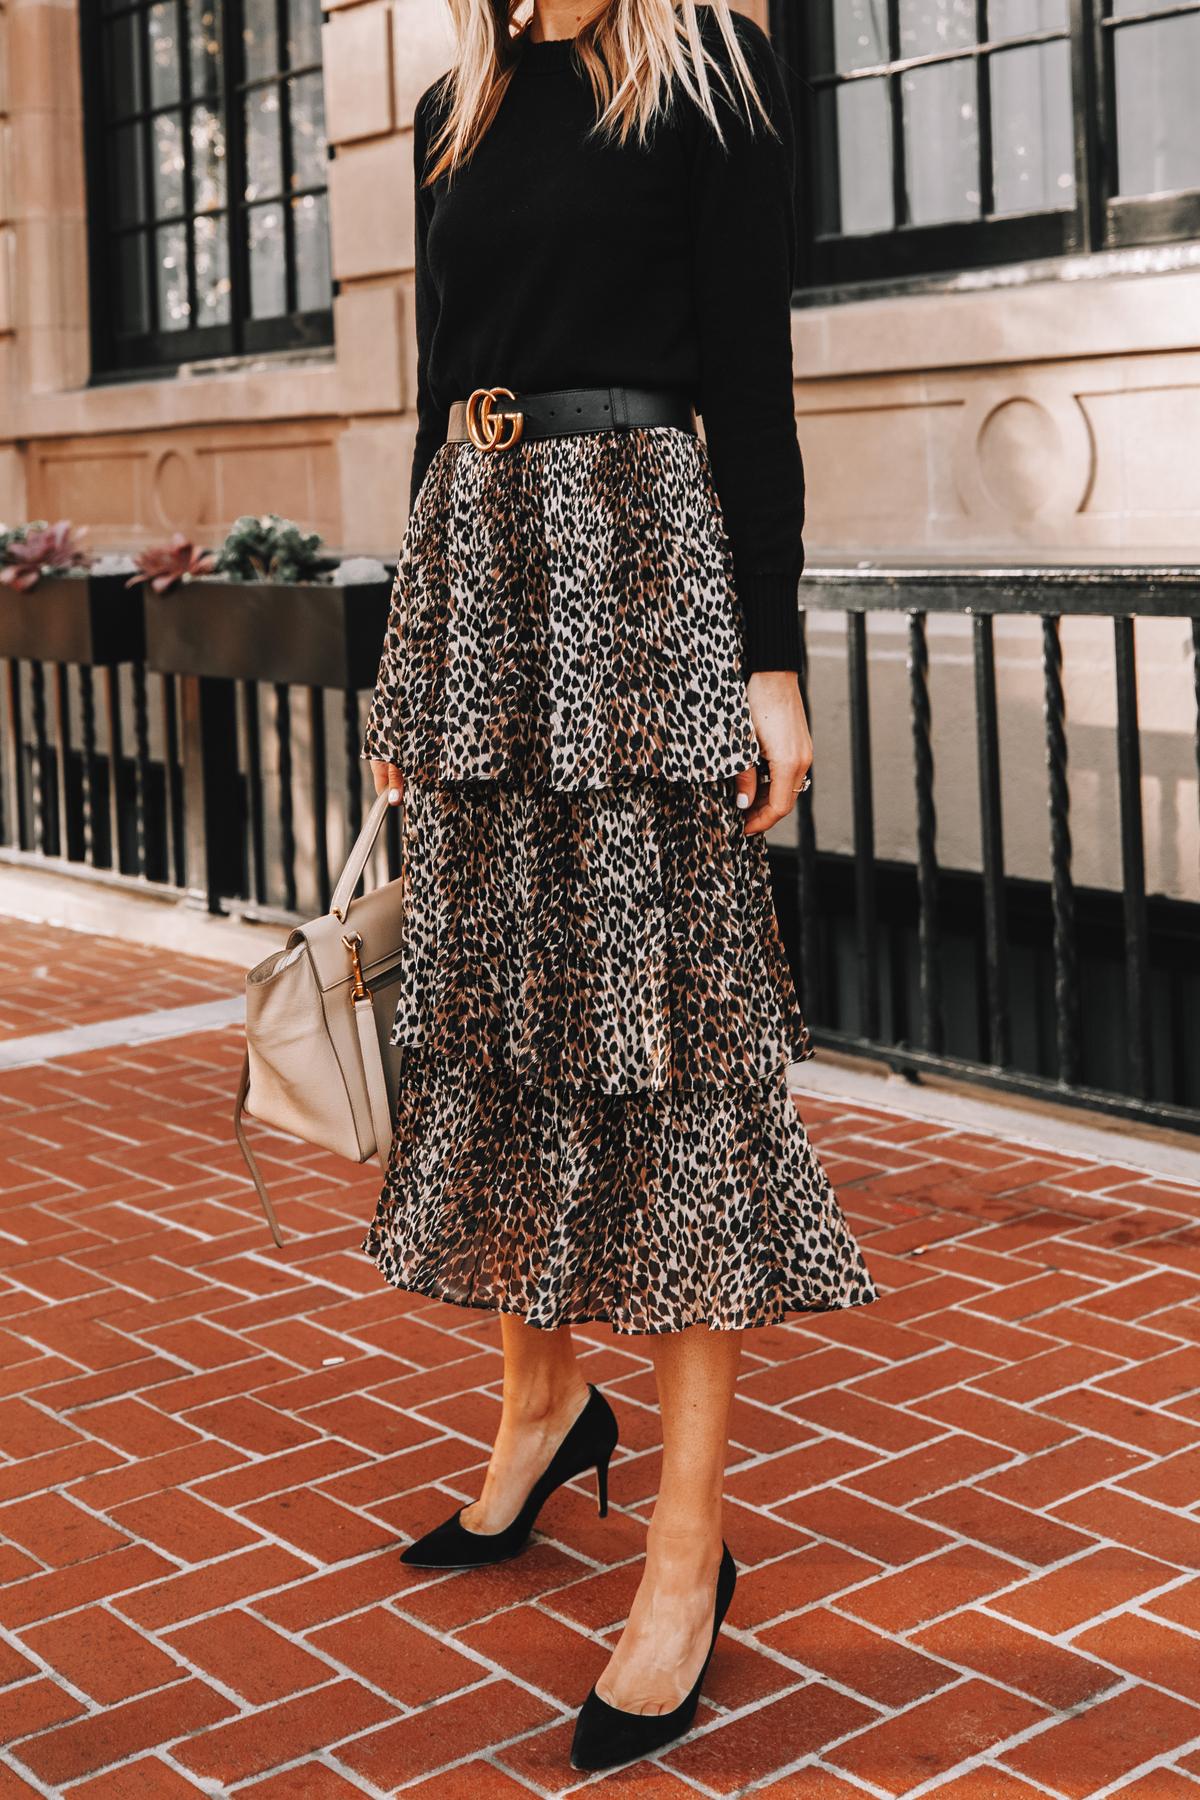 Fashion Jackson Wearing Black Sweater Topshop Leopard Tiered Midi Skirt Black Pumps